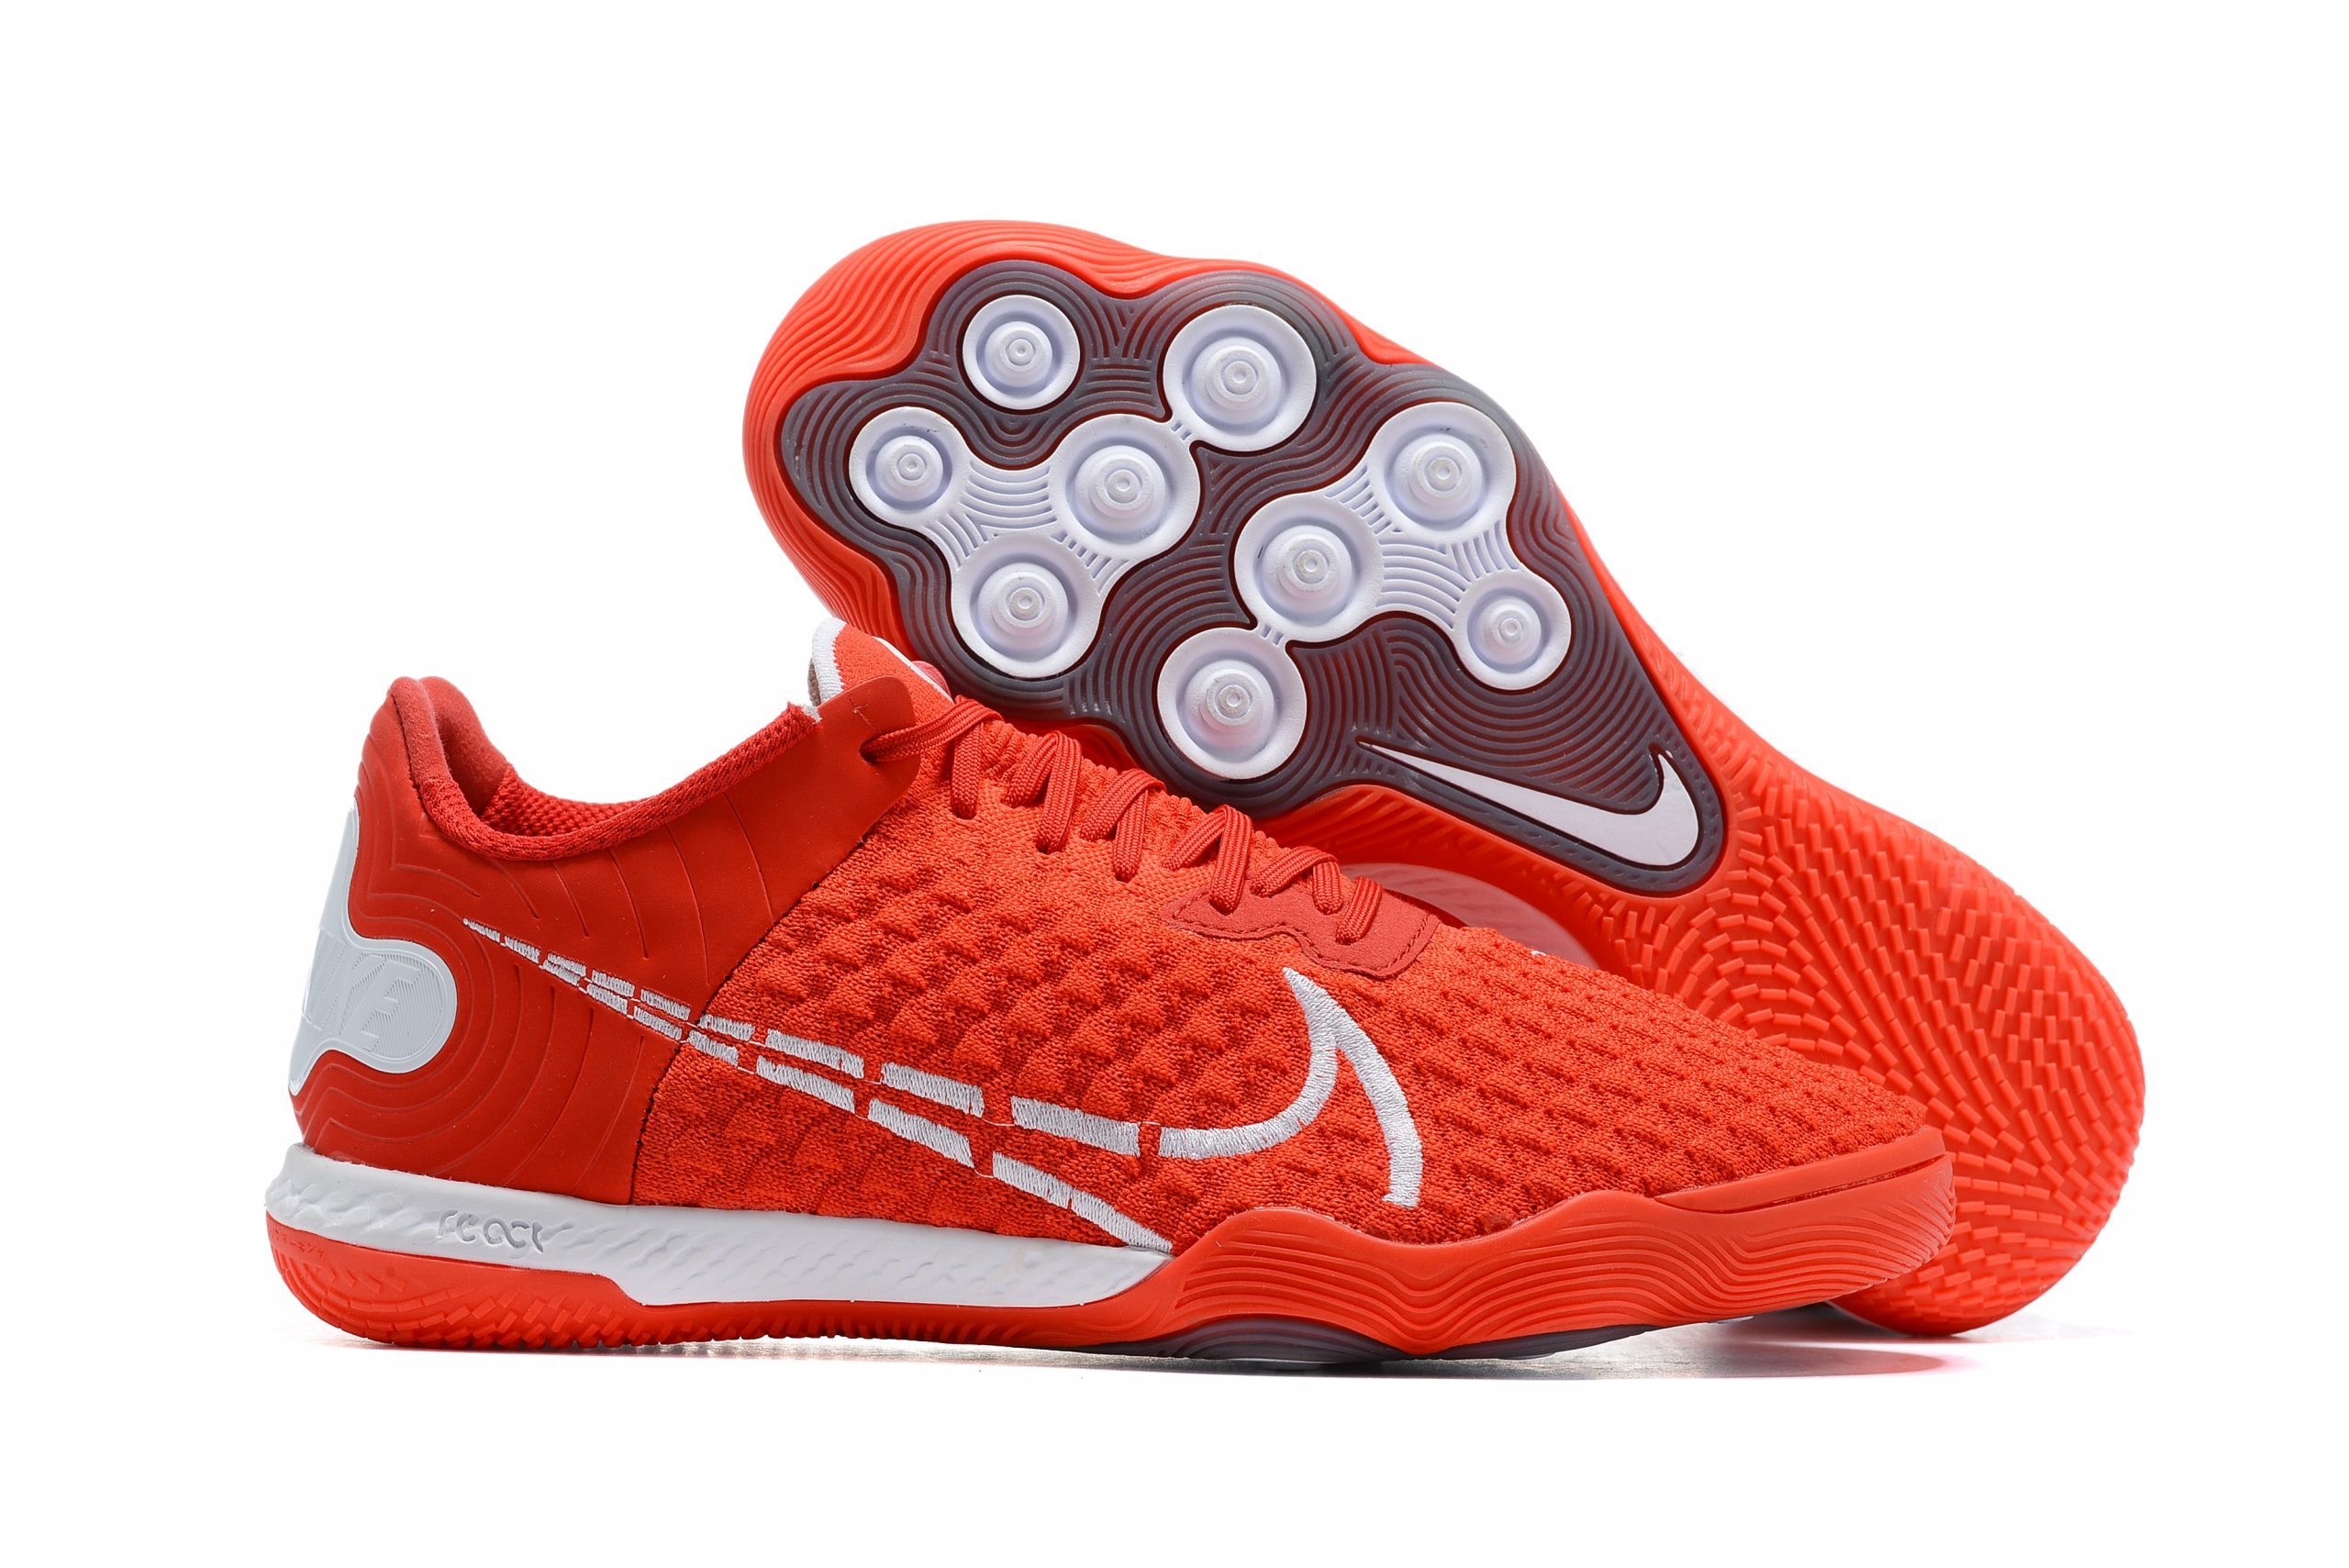 Nike Reactgato IC red football boots Outside